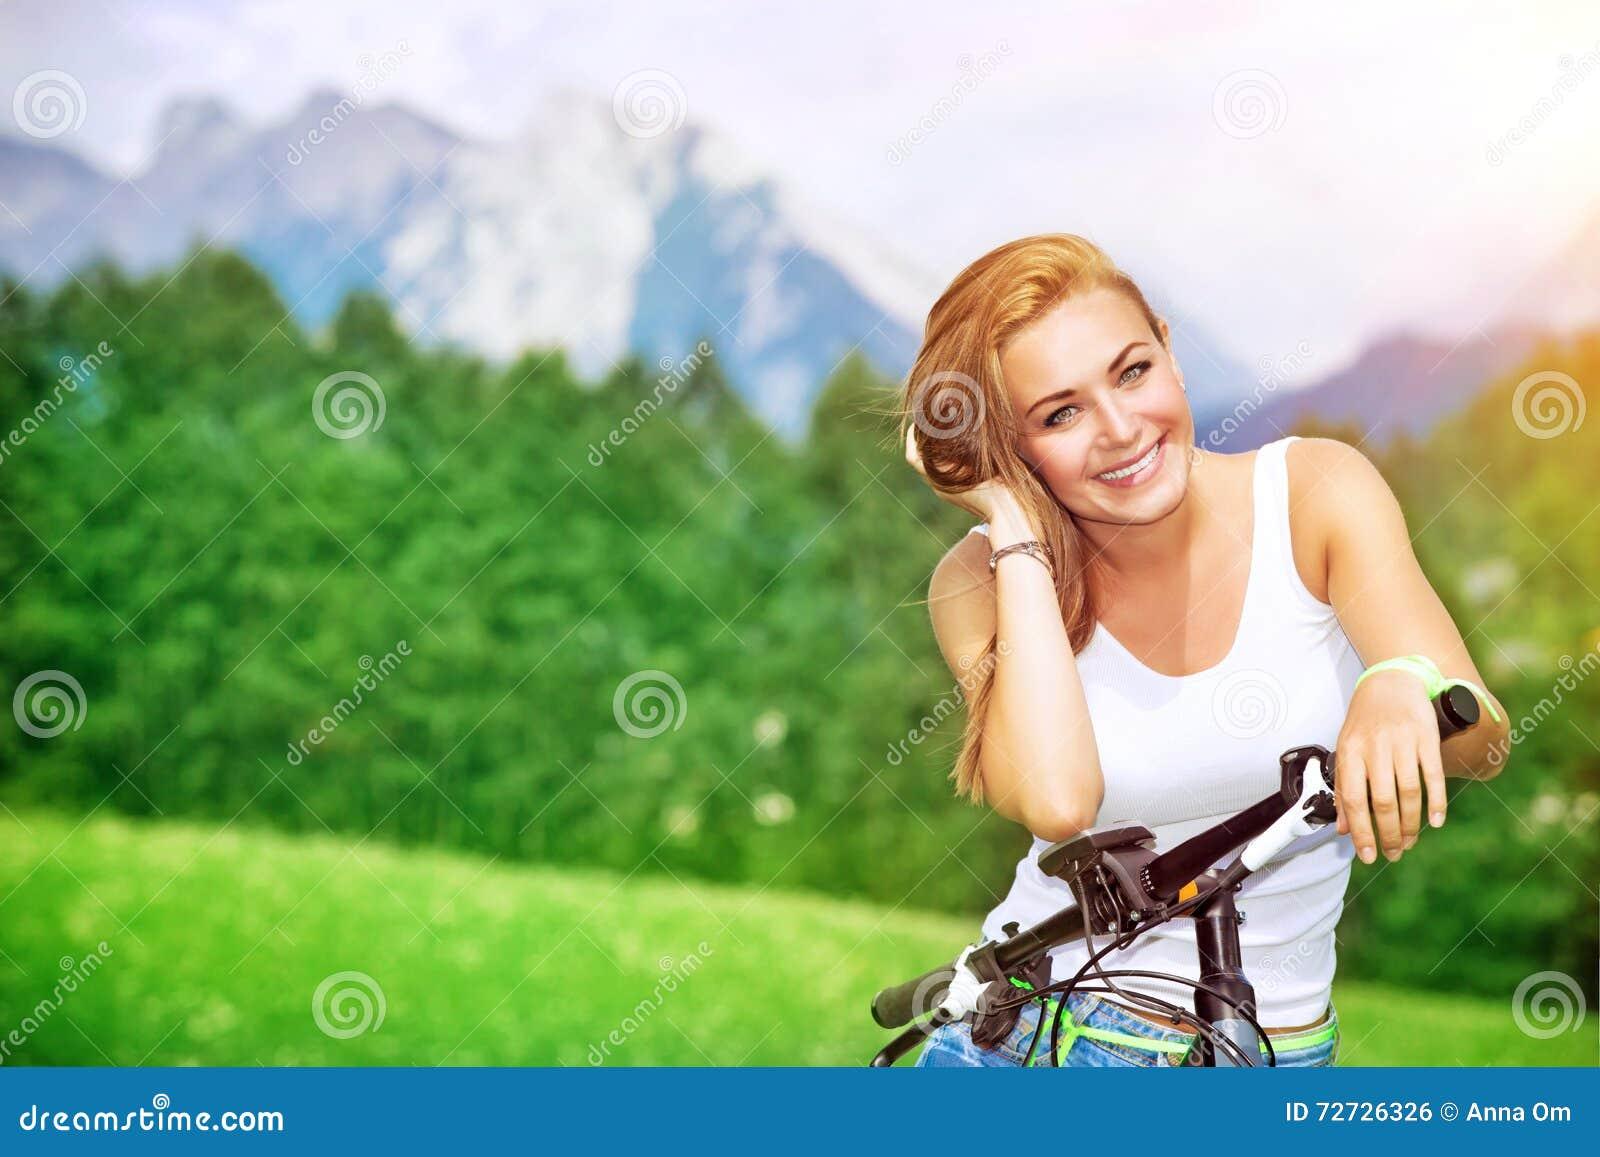 Happy woman cycling